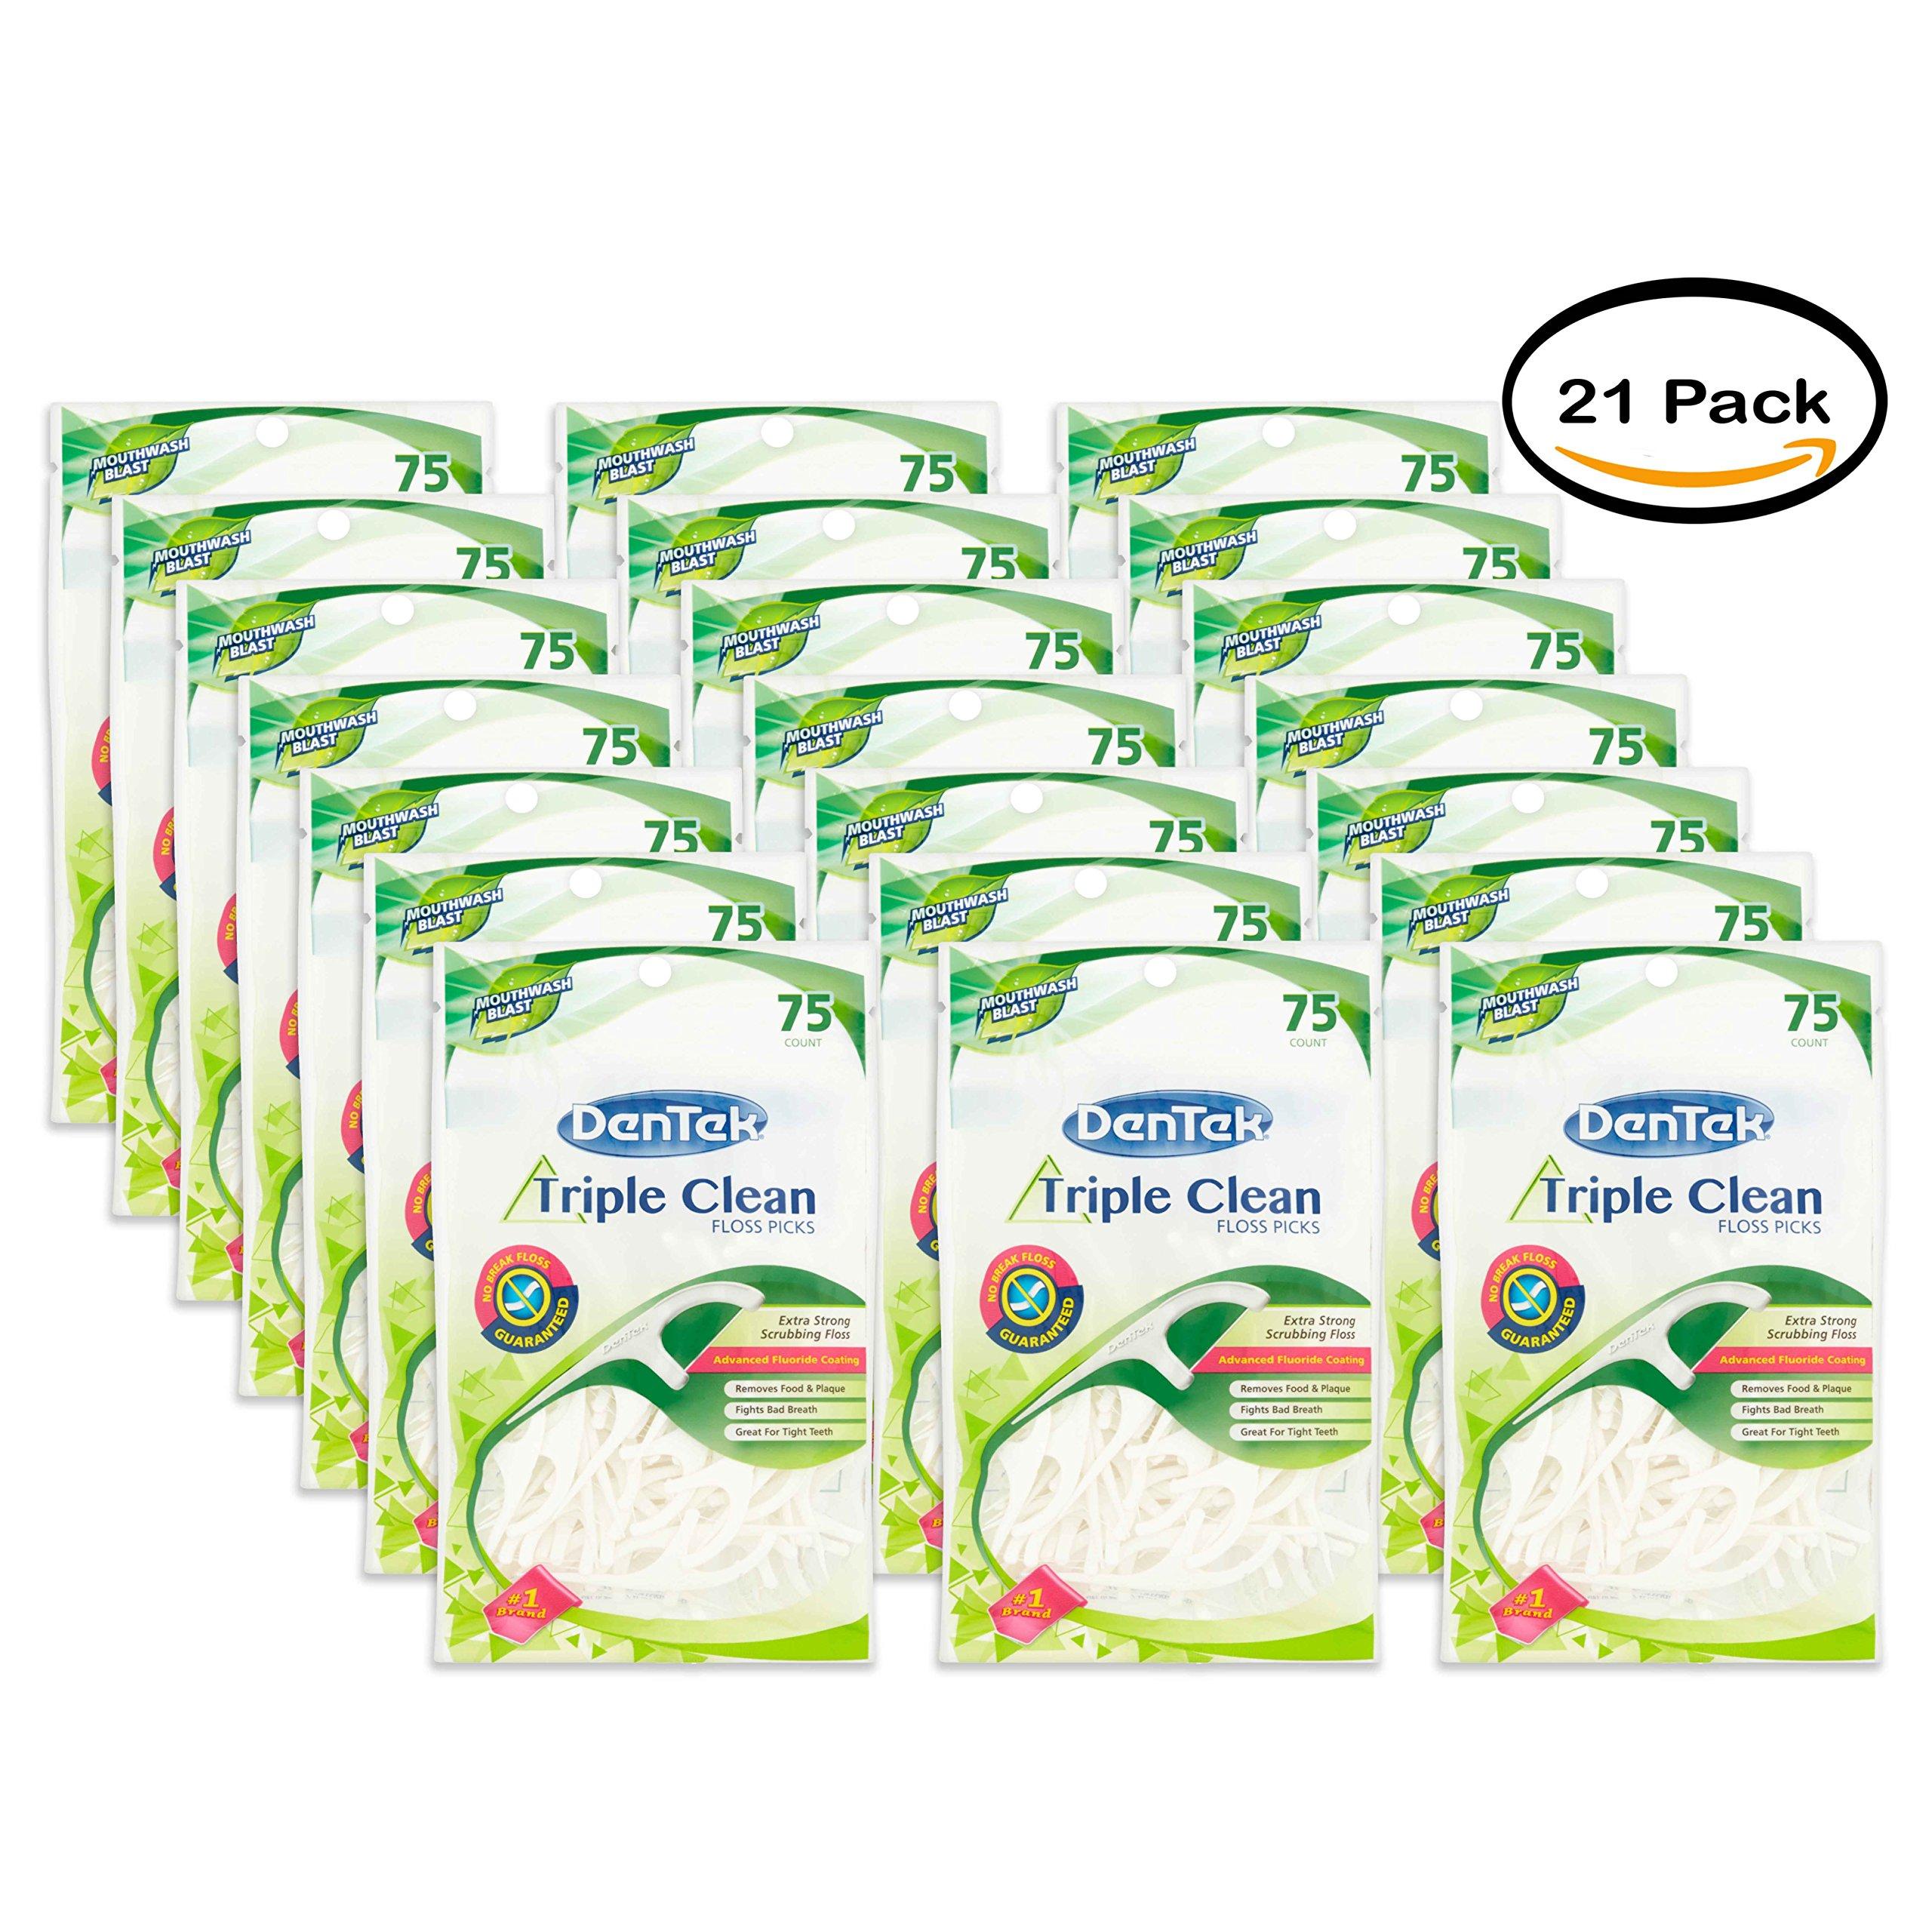 PACK OF 21 - DenTek Triple Clean Fresh Mint Floss Picks, 75 count